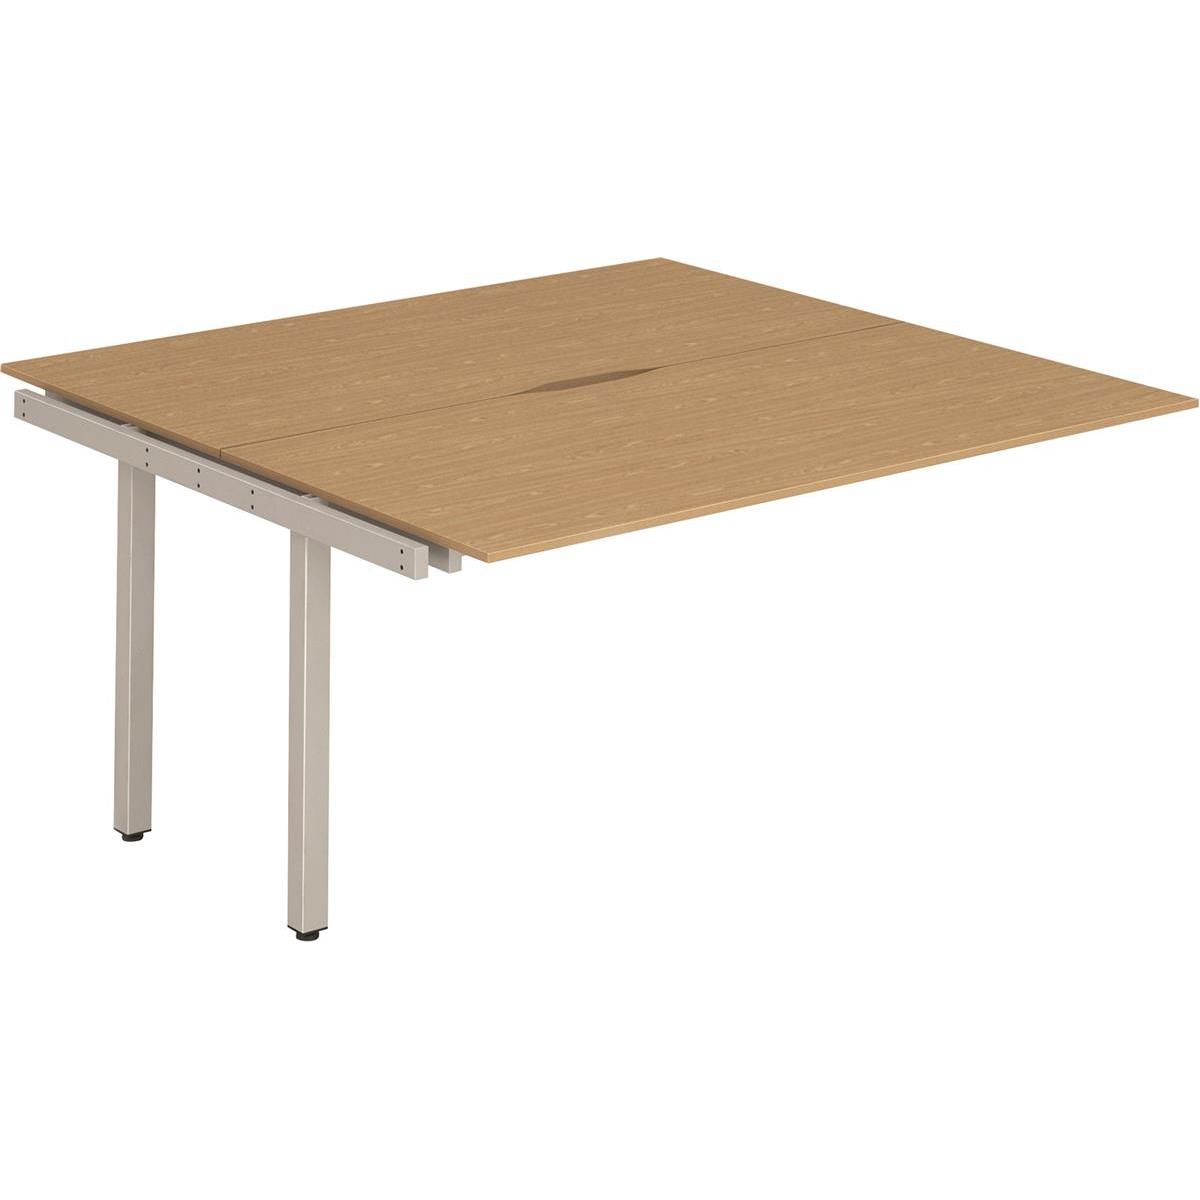 Trexus Bench Desk Double Extension Back to Back Configuration Silver Leg 1600x1600mm Oak Ref BE207